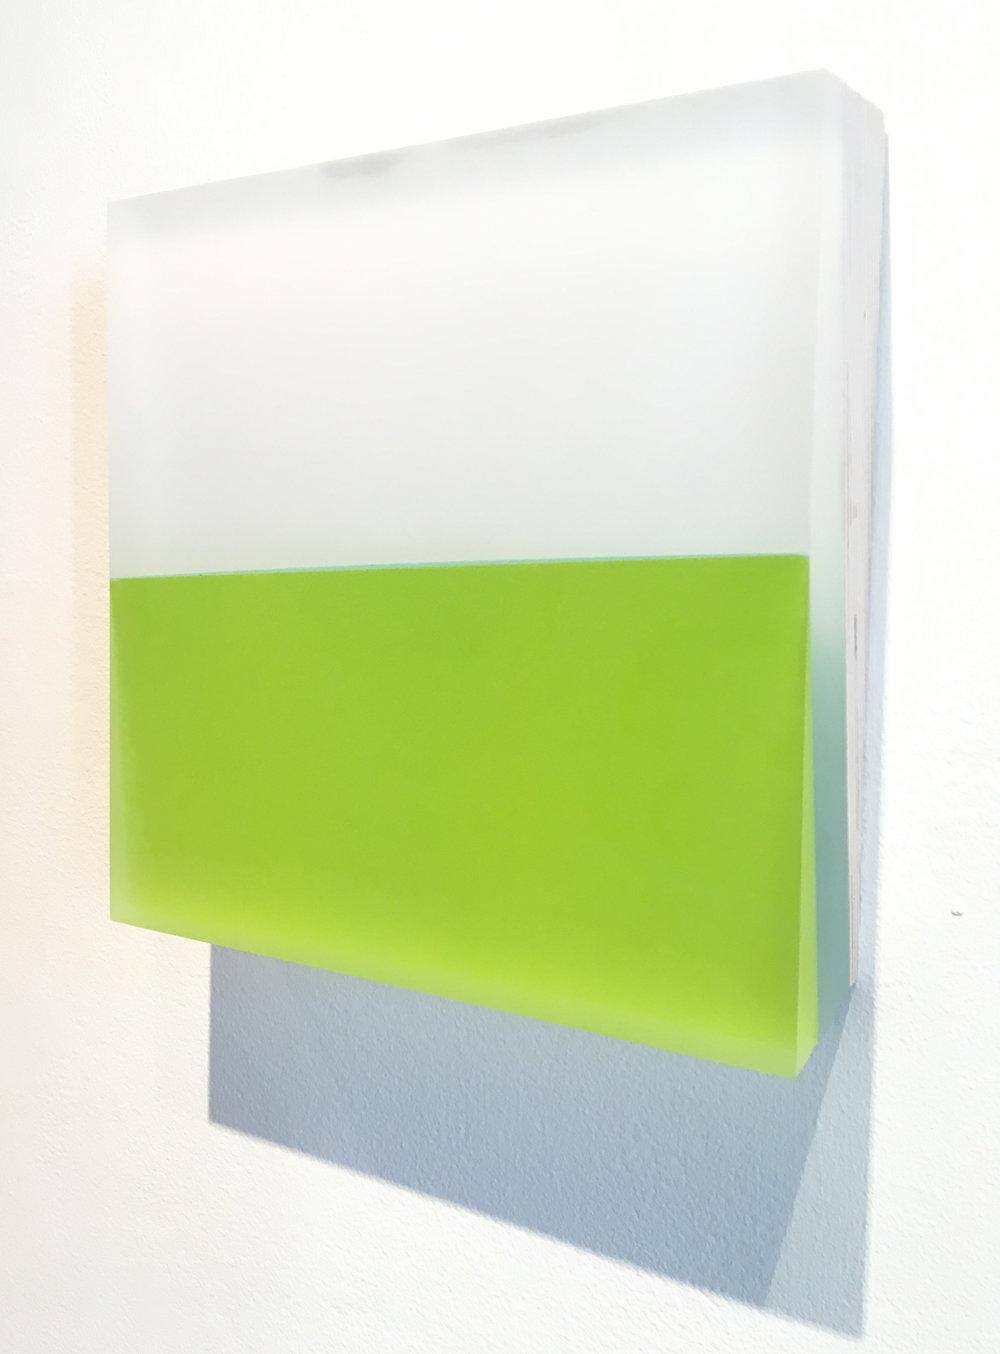 MICHELLE BENOIT | Surround, Chartreuse